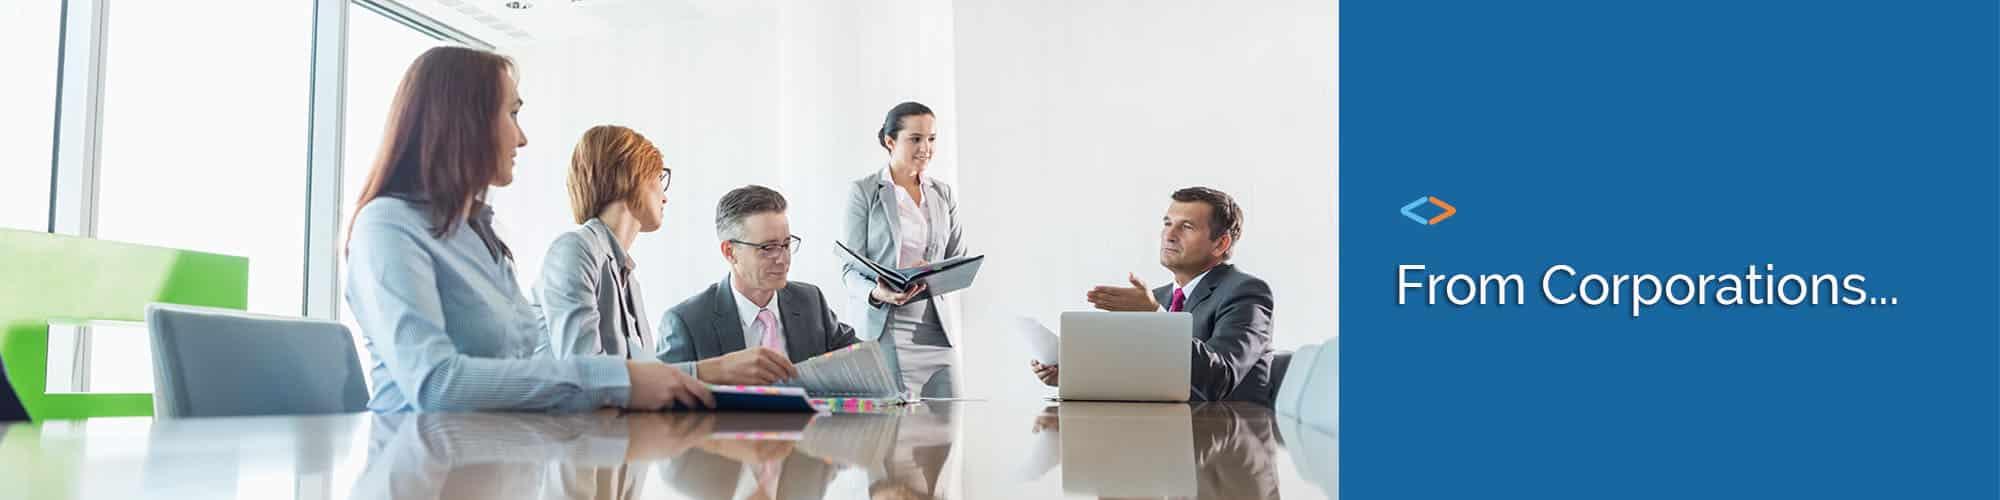 MK Brazil Accountants | Corporations